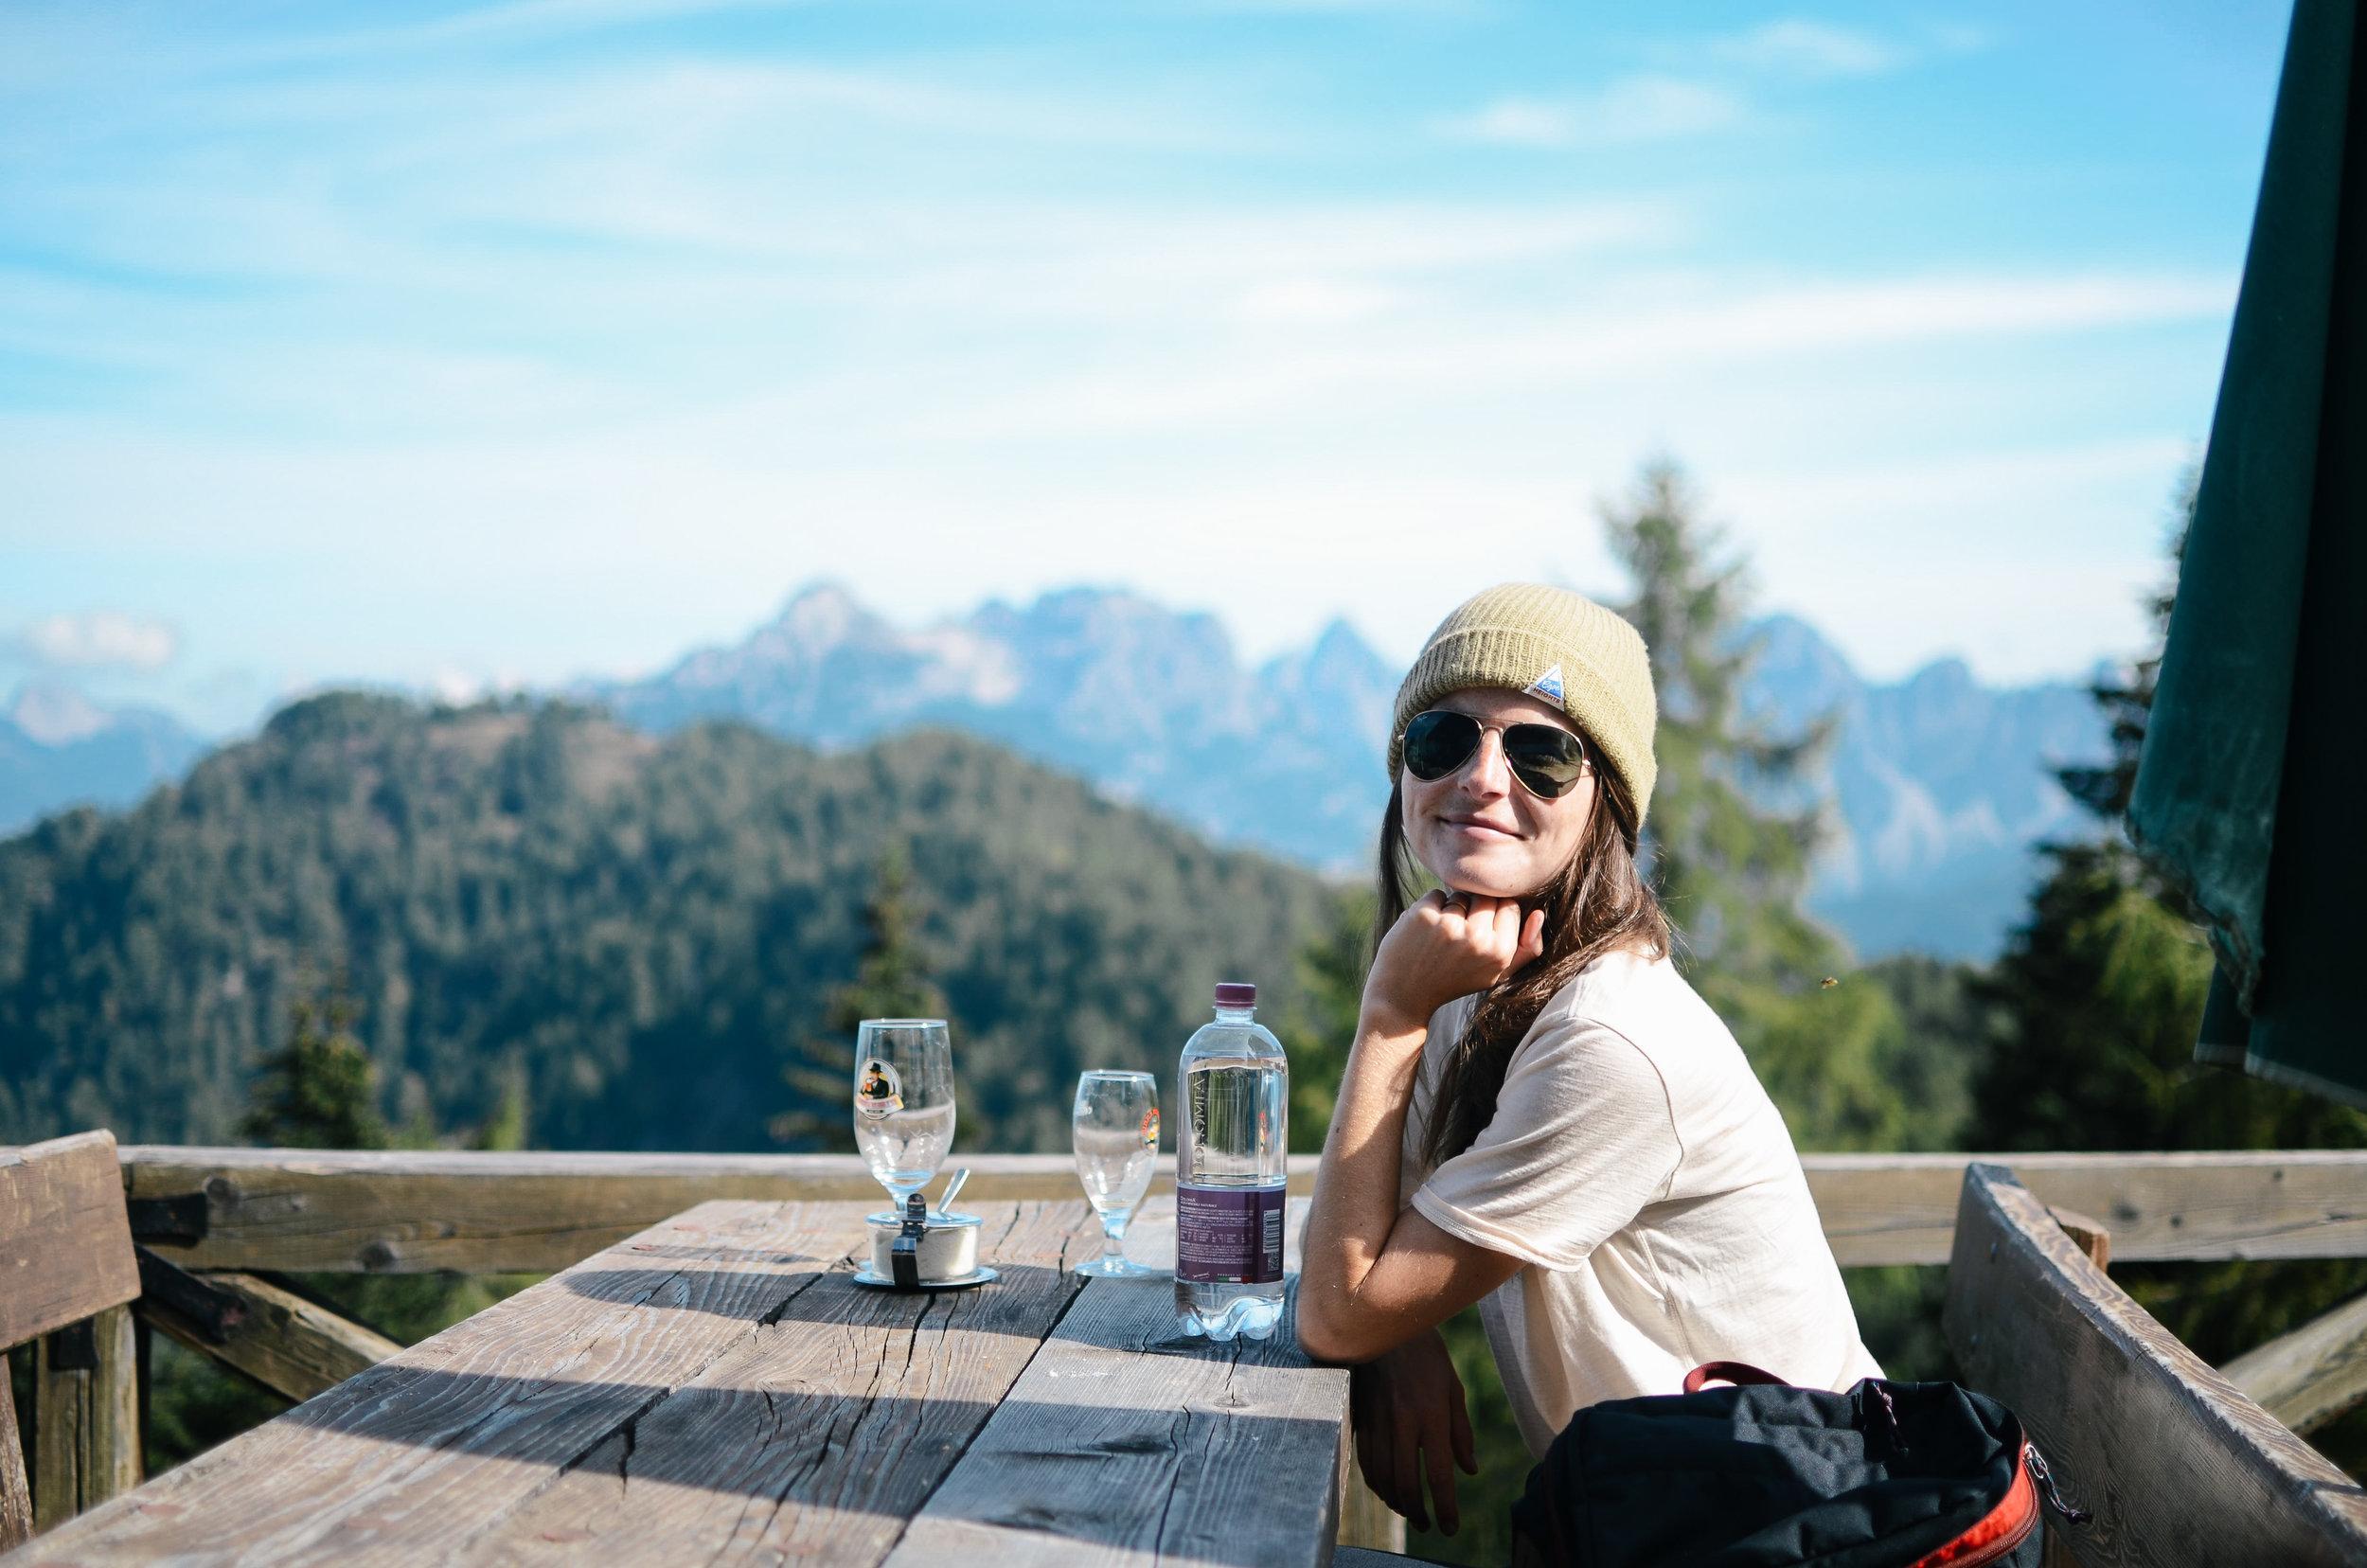 adventure-in-italy-3-hikes-dolomites-hiking-travel-blog-tyrol-8.jpg